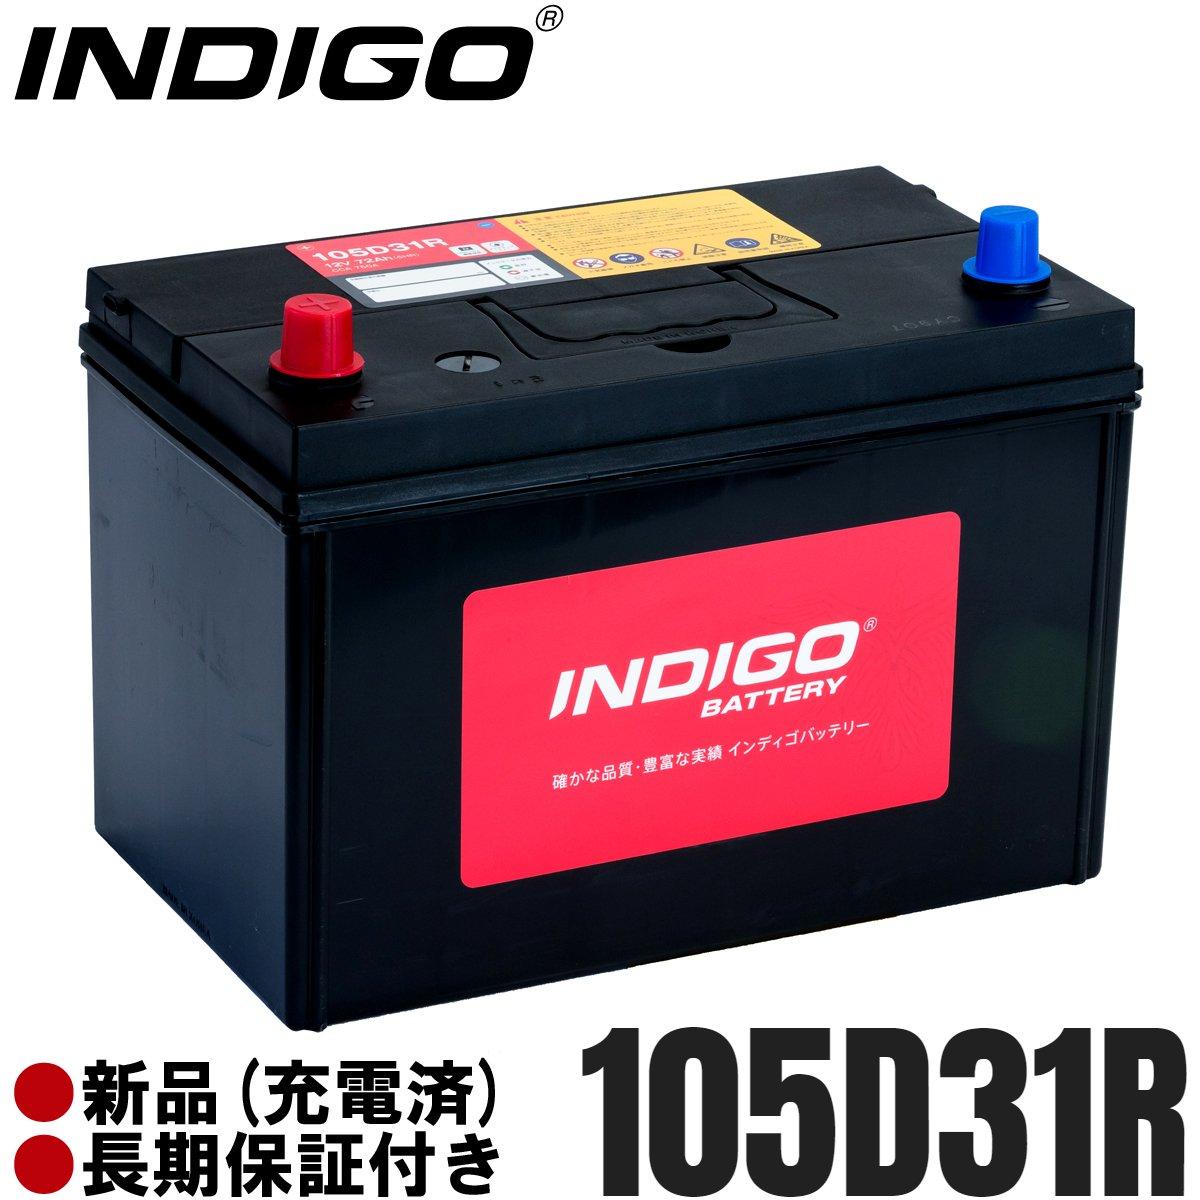 INDIGO バッテリー 105D31R ライトエースバン KJ-CR52V H14/7~H16/8 4WD AT B07DJ321M8